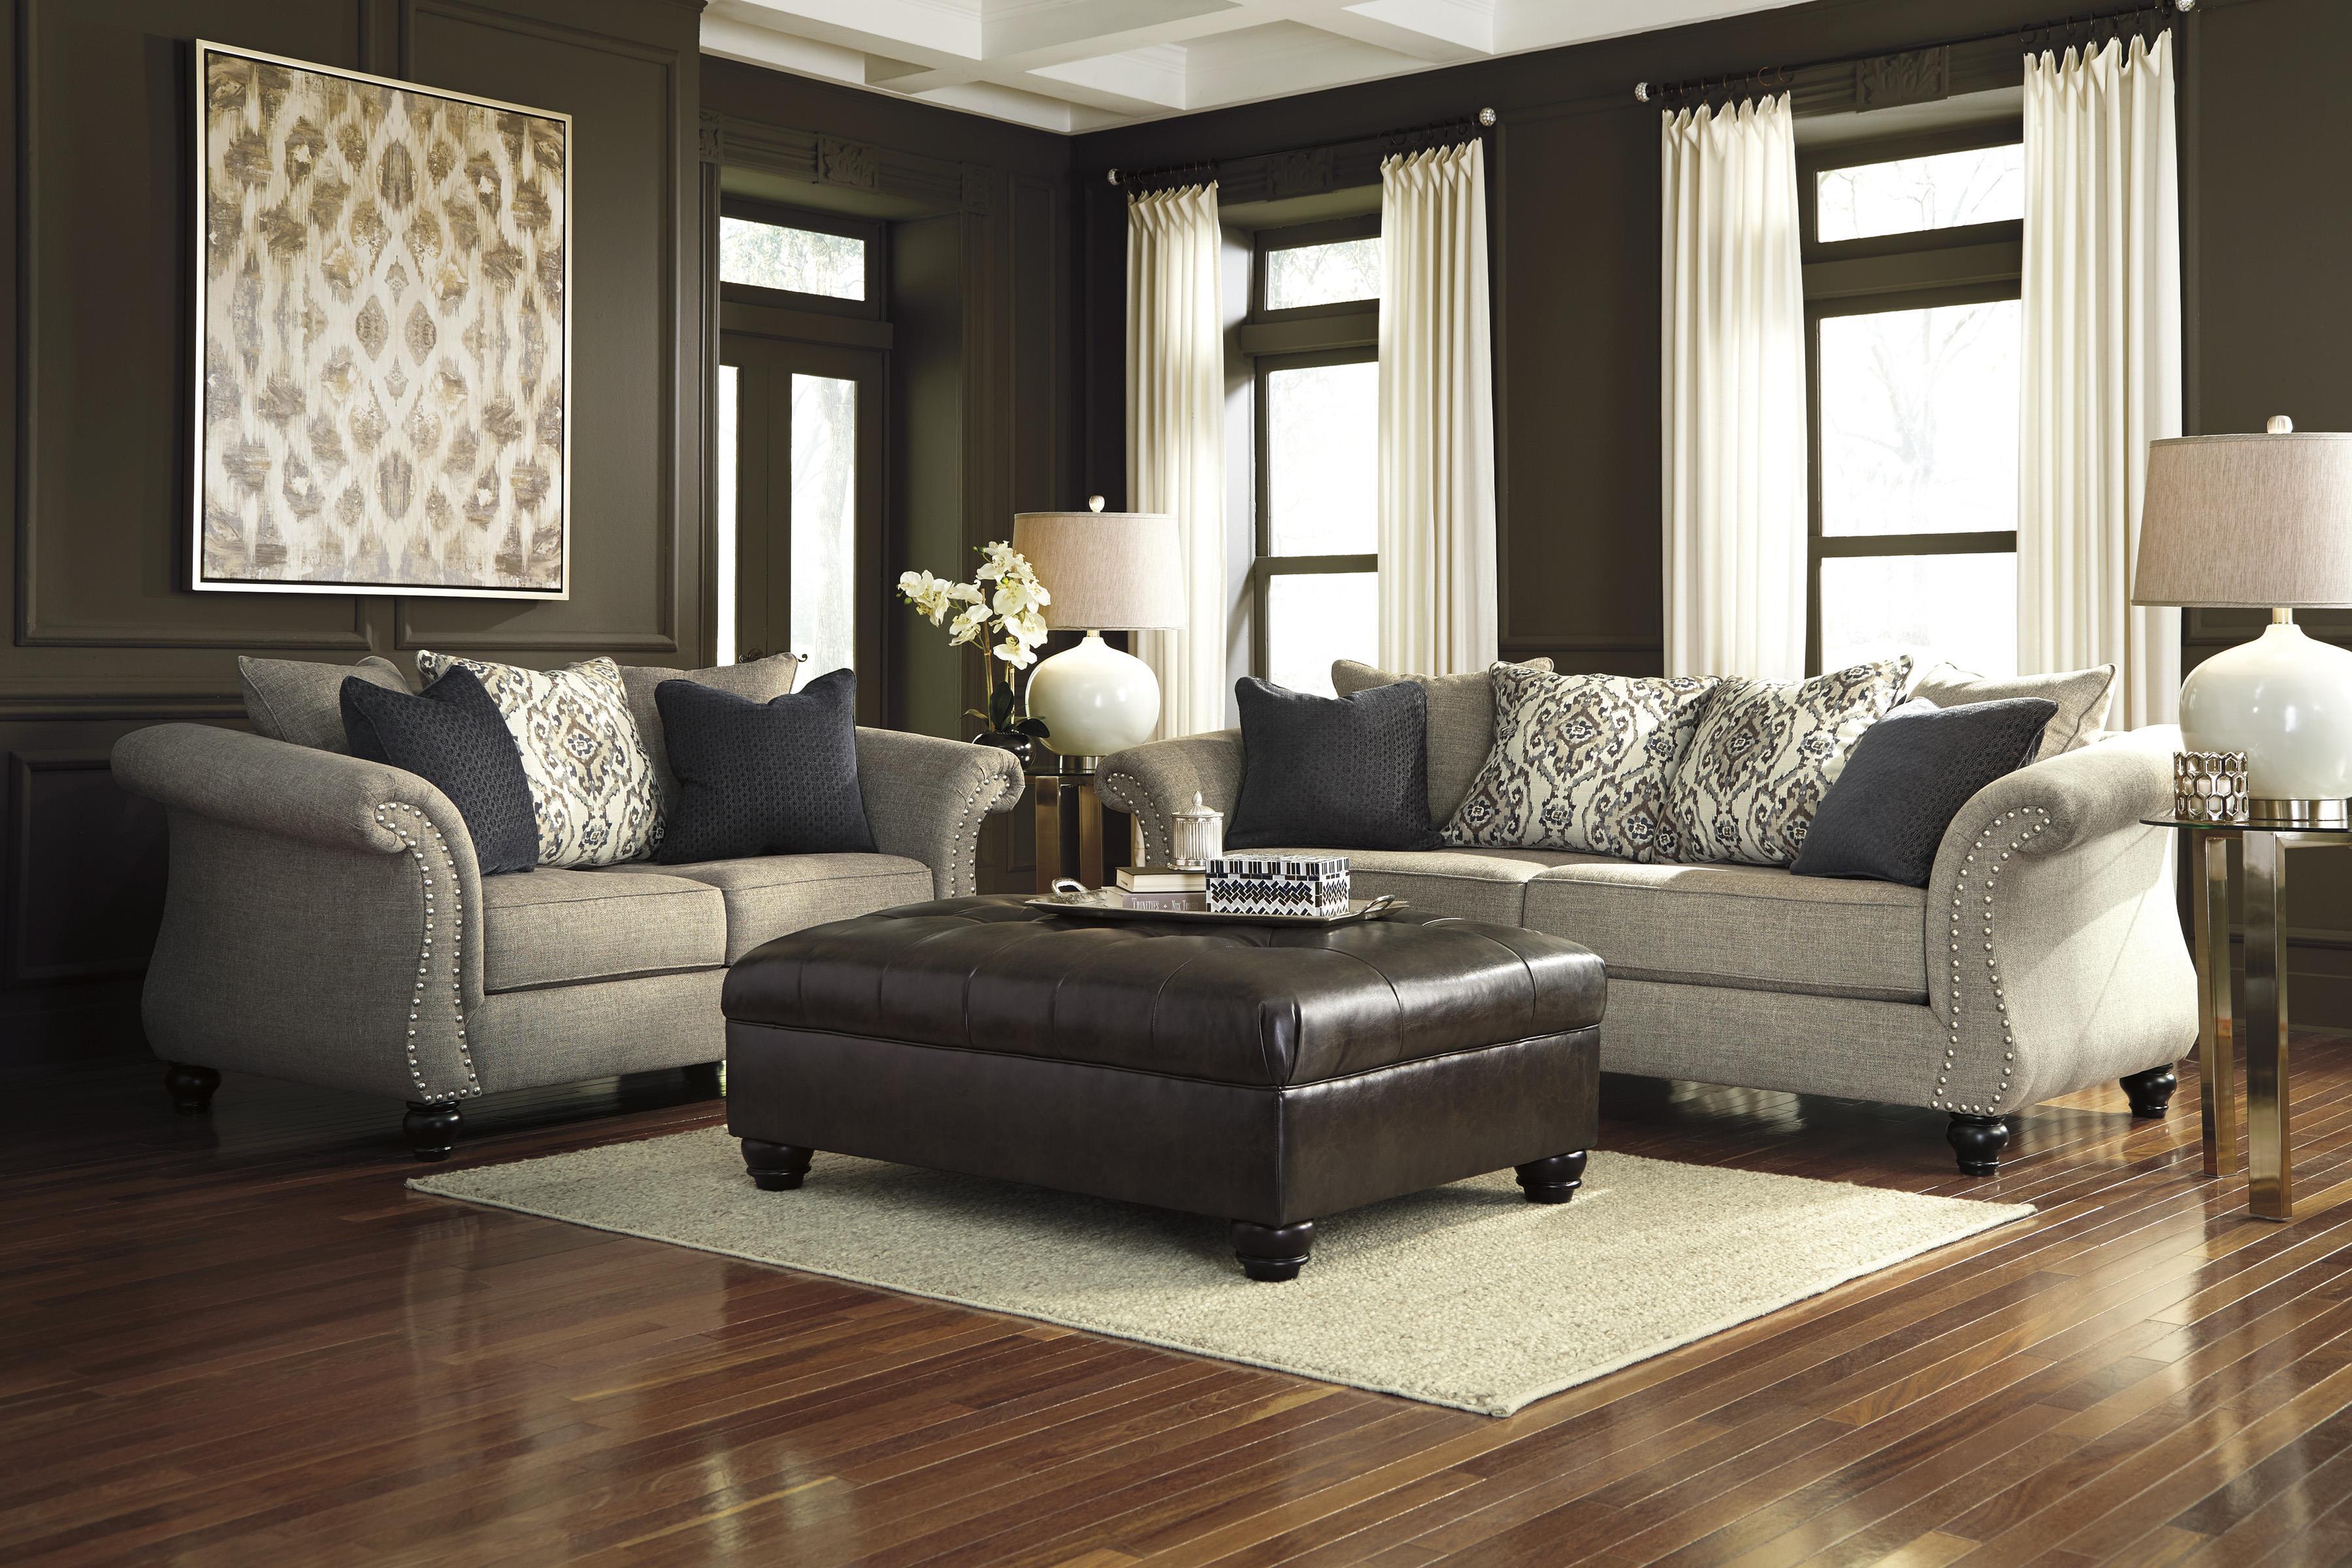 Benchcraft Jonette Stationary Living Room Group - Item Number: 46101 Living Room Group 2